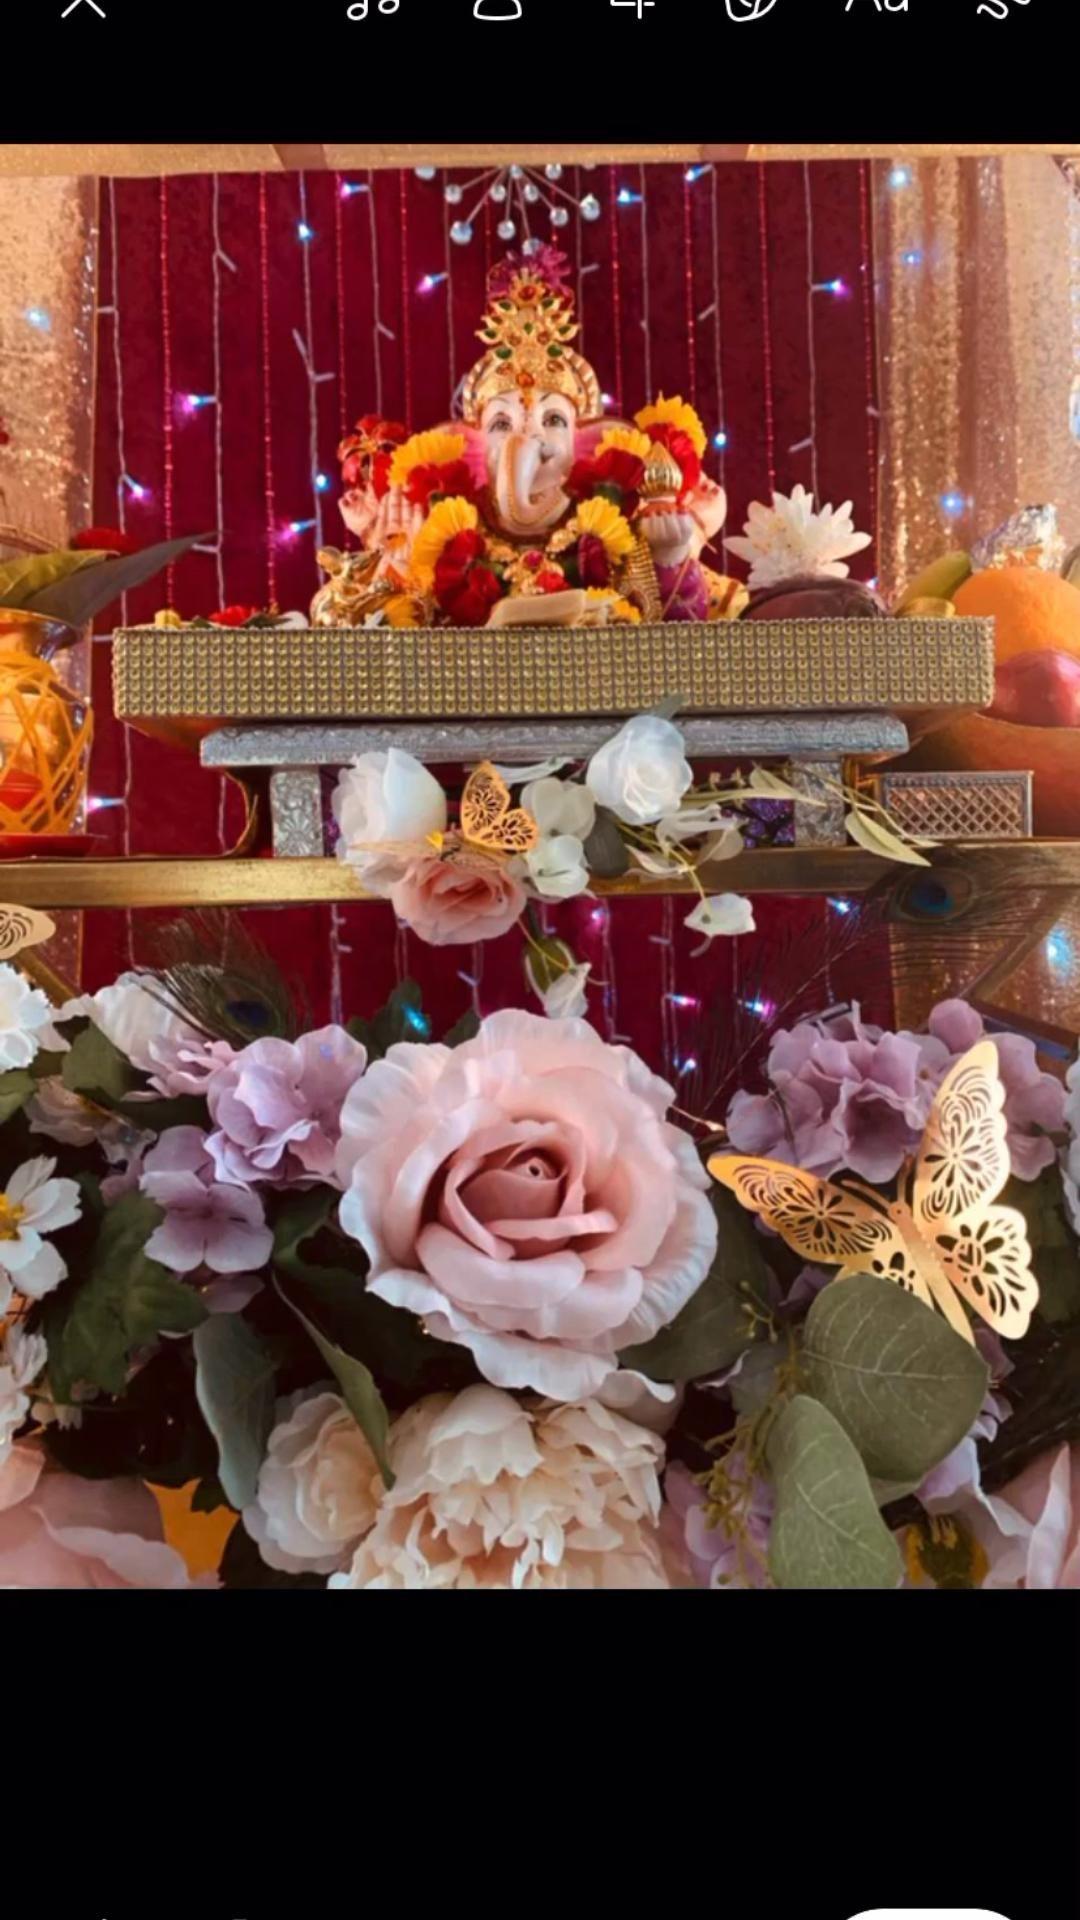 🌺🙏🏻Ganpati Bappa Morya 🙏🏻🌺2021(homemade decorations)